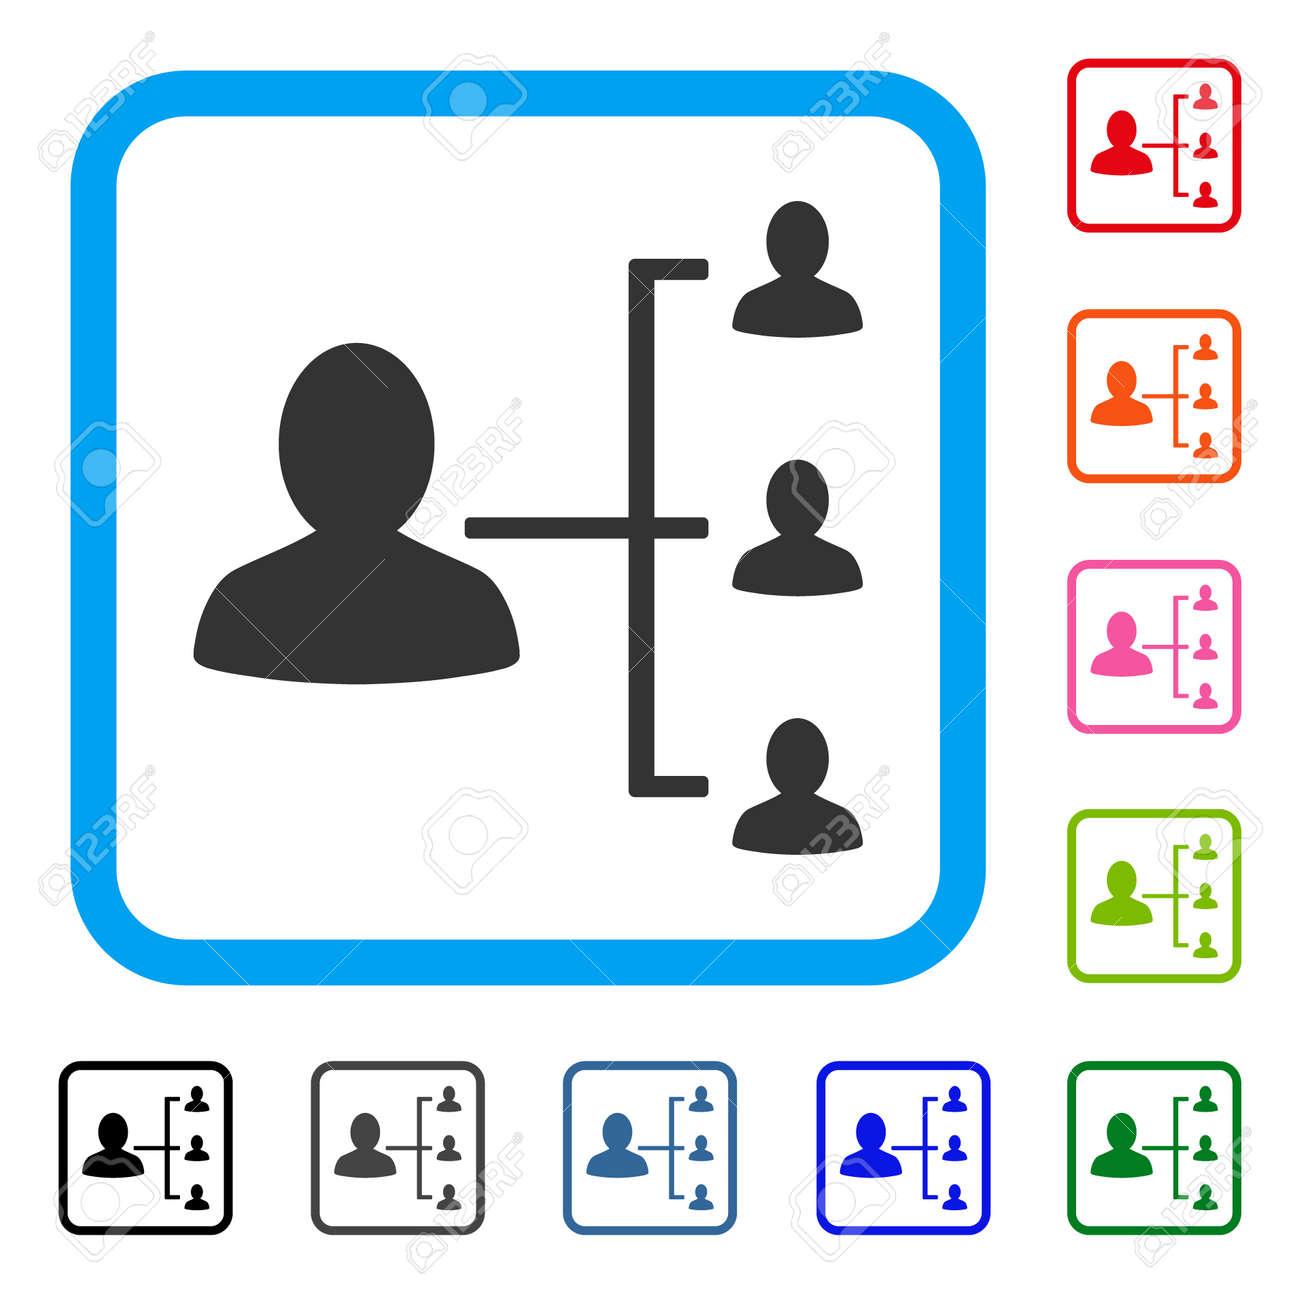 Pdf) luis: a light weight user identification scheme for smartphones.